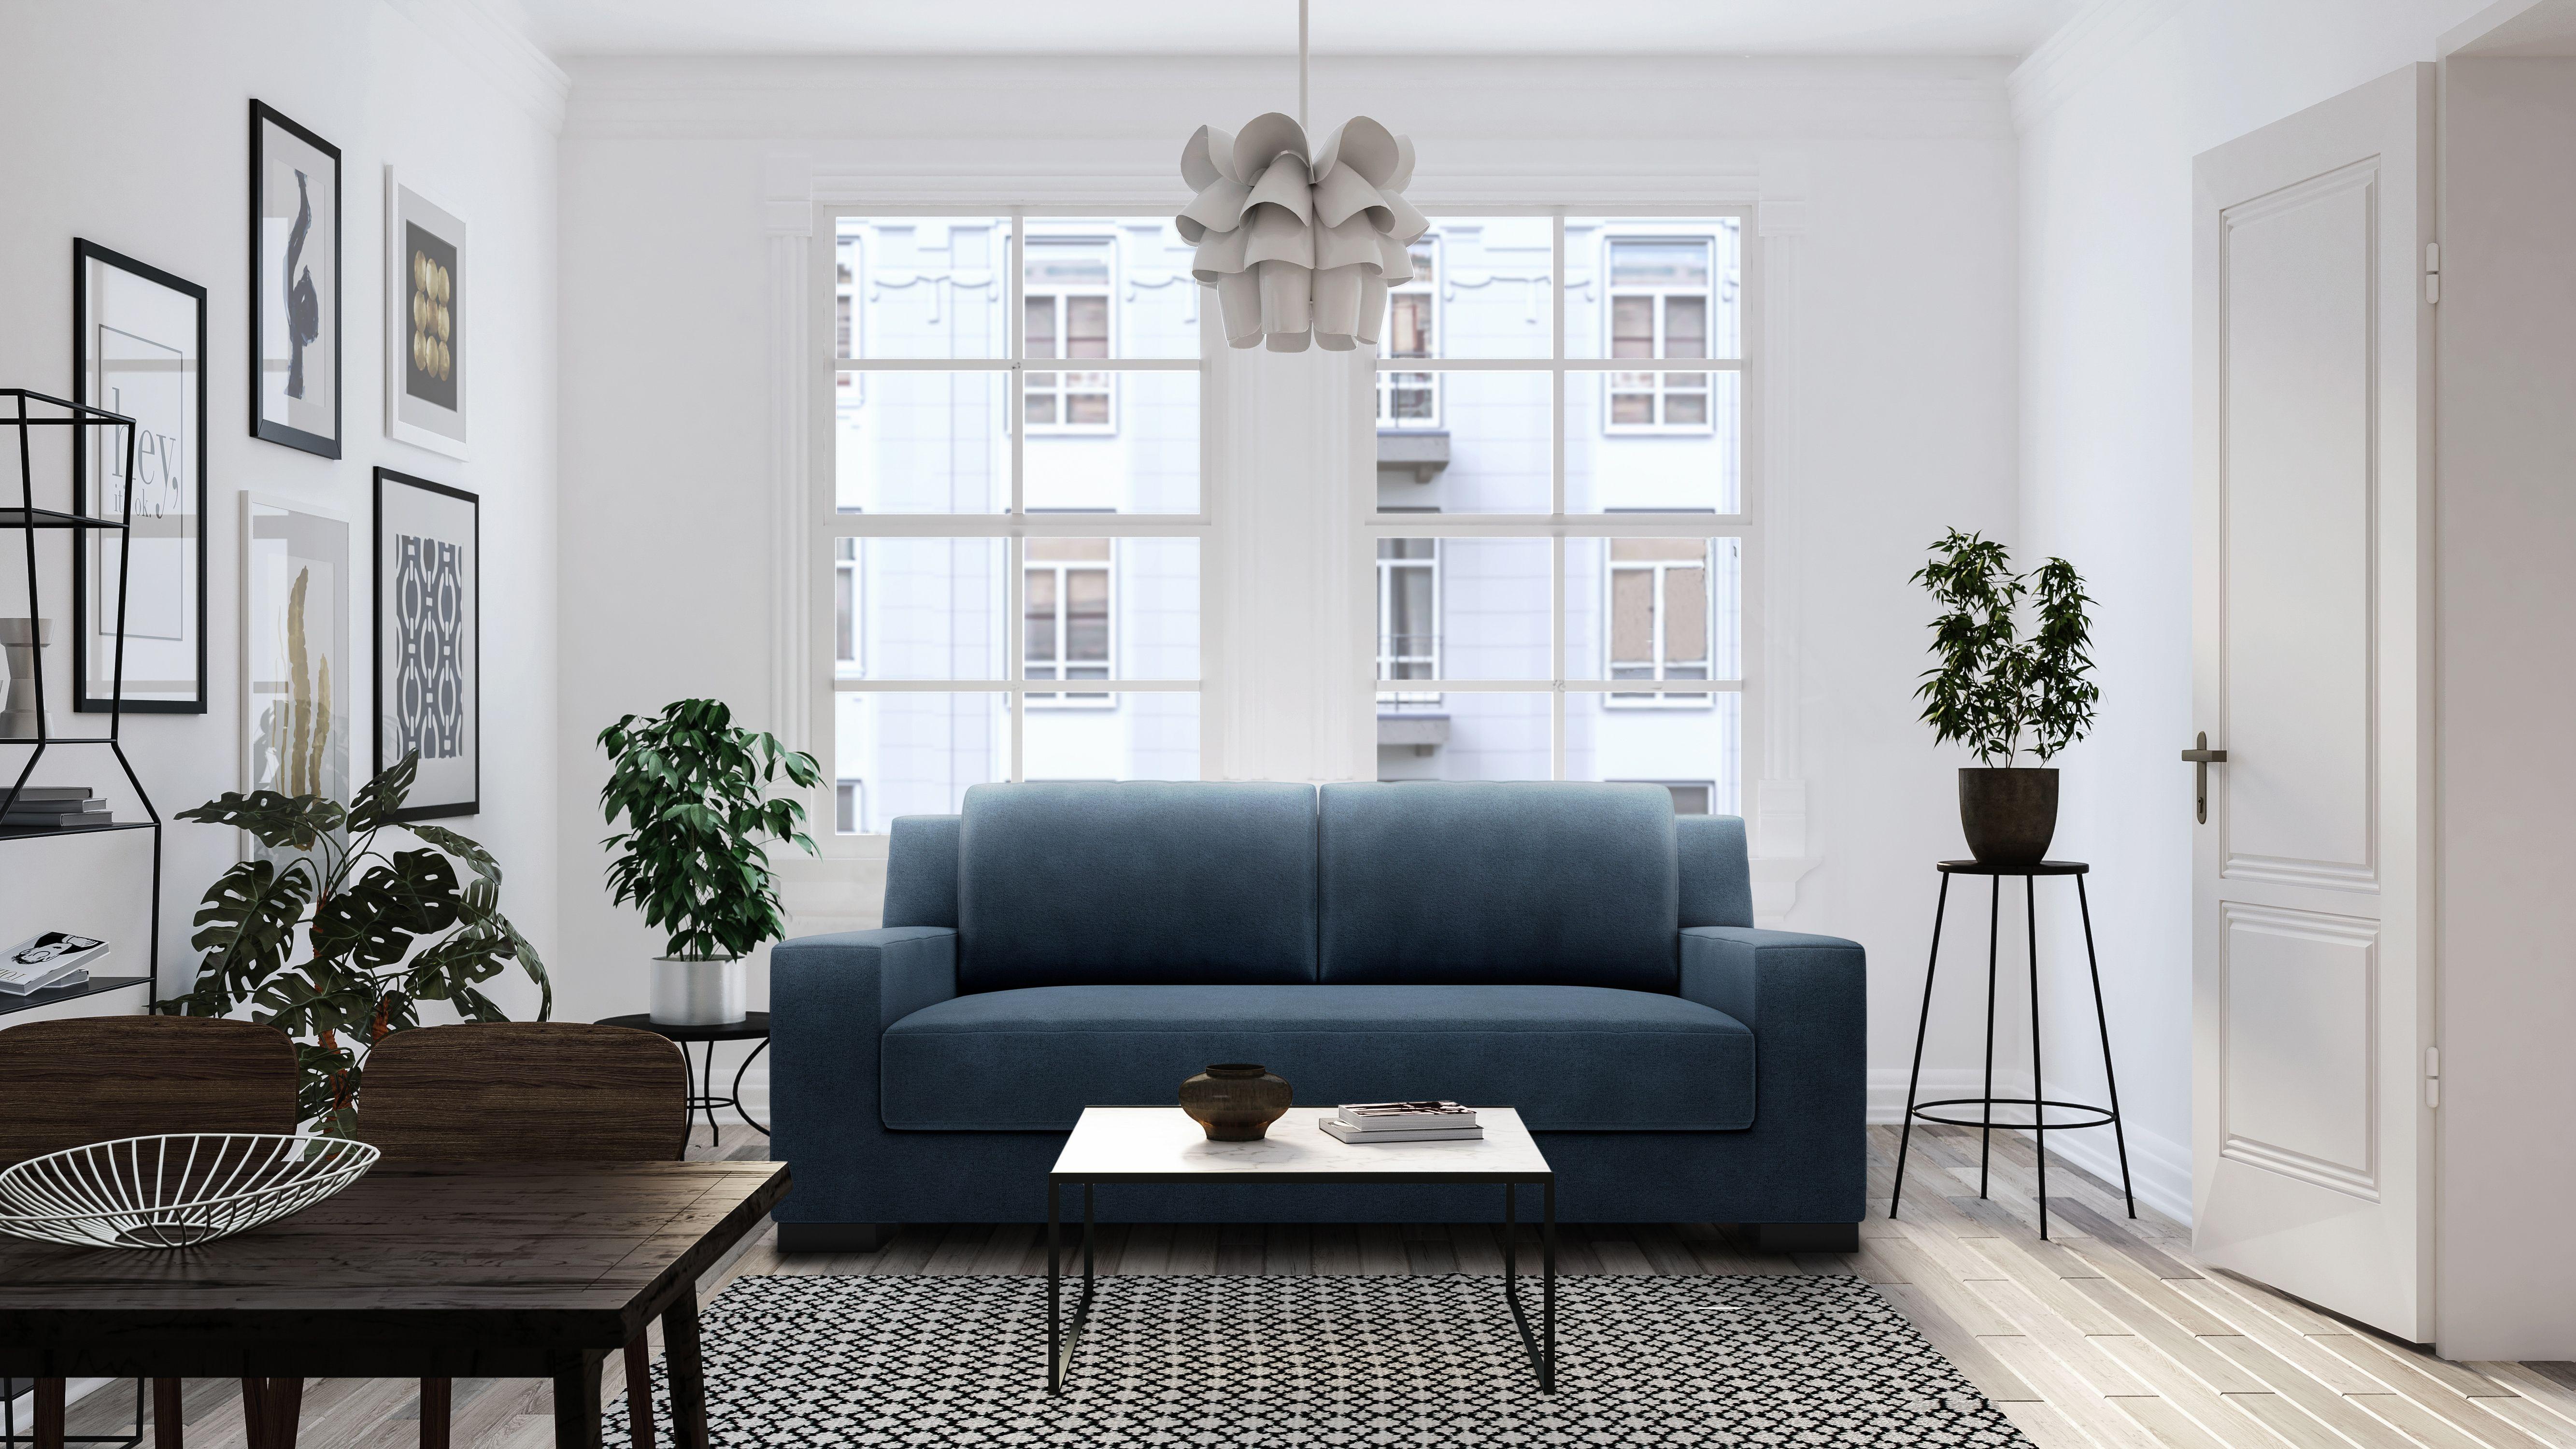 Apartments Futuristic Apartment Living Room Design With L Shape